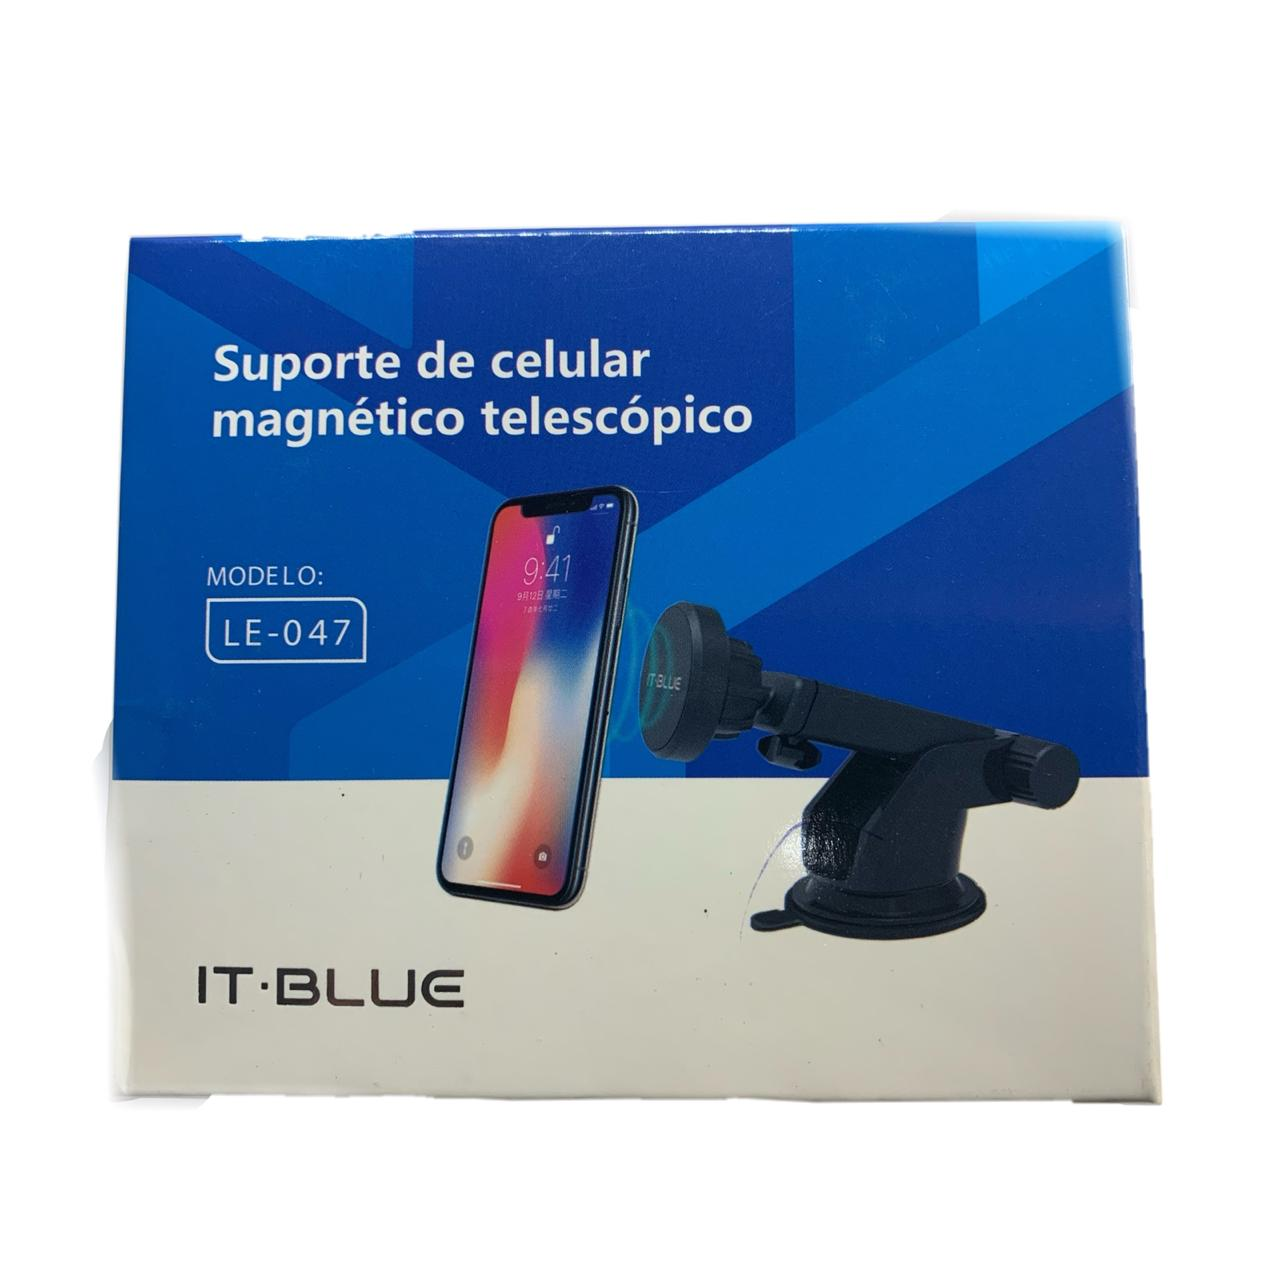 Suporte de celular magnético telescópio